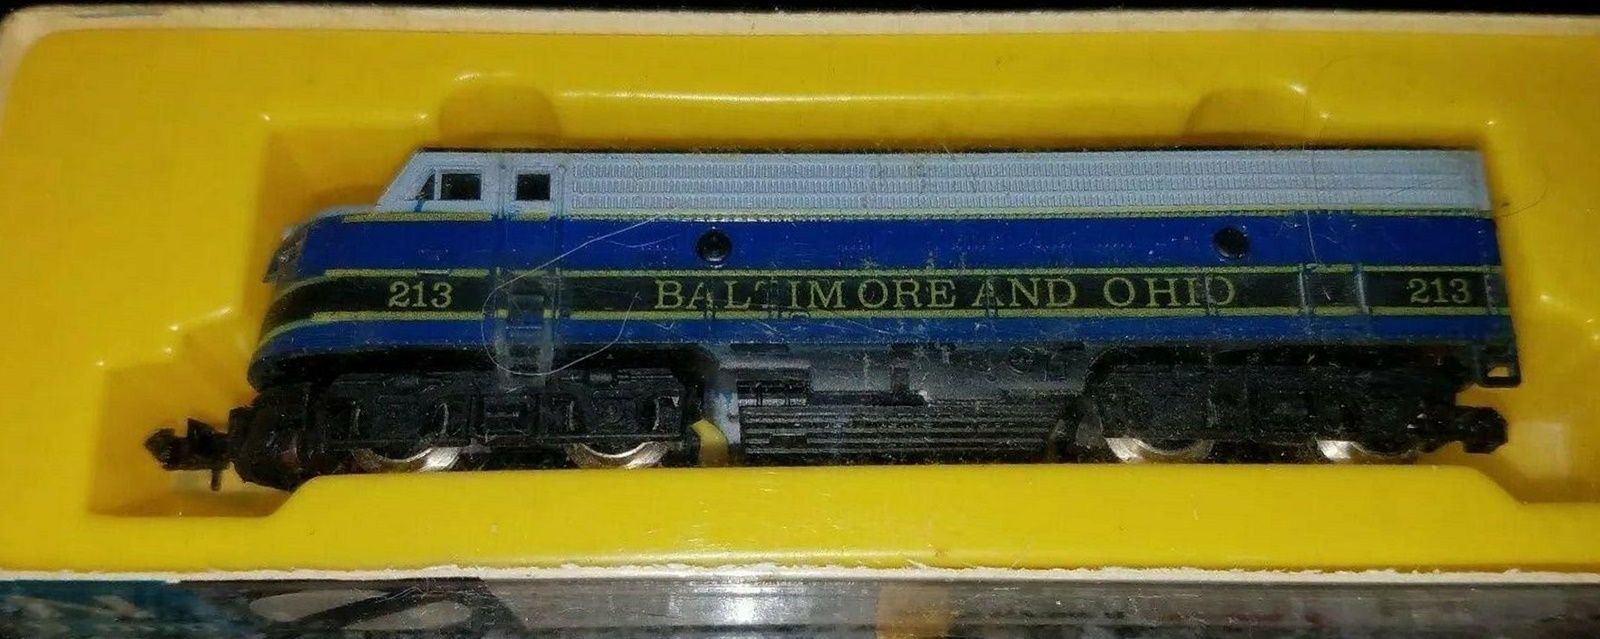 N Scale - Arnold - 0214 - Locomotive, Diesel, EMD FP9 - Baltimore & Ohio - 213